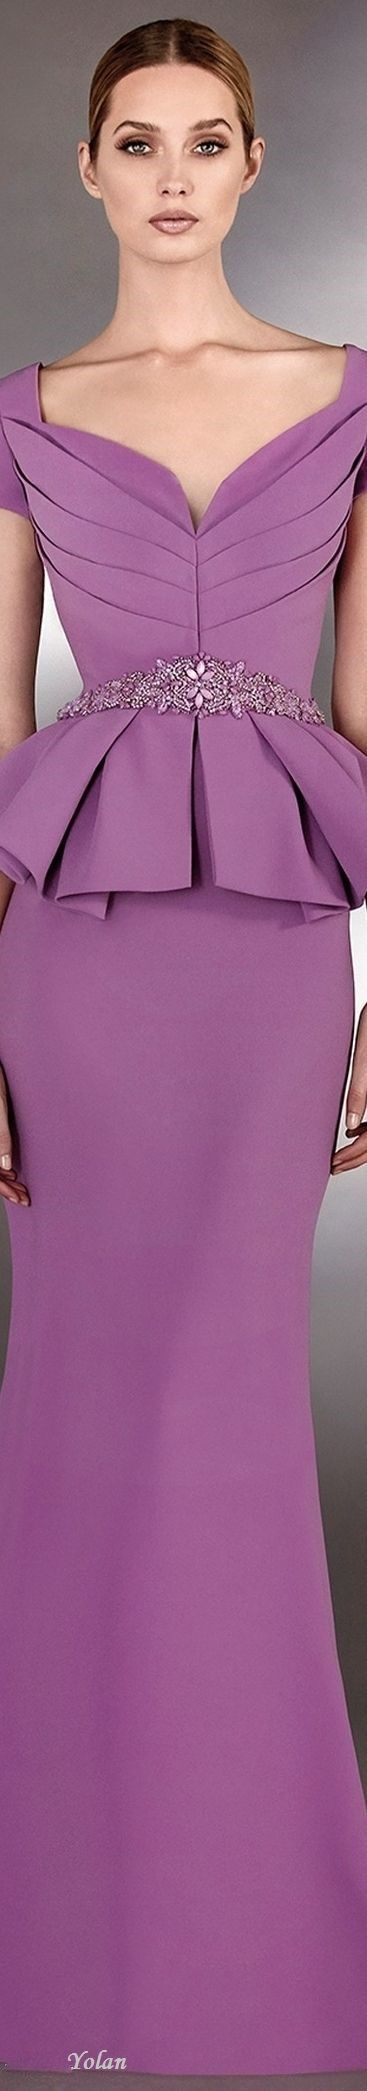 DISEÑO ELEGANTE | Robe mère de la marié | Pinterest | Elegante ...